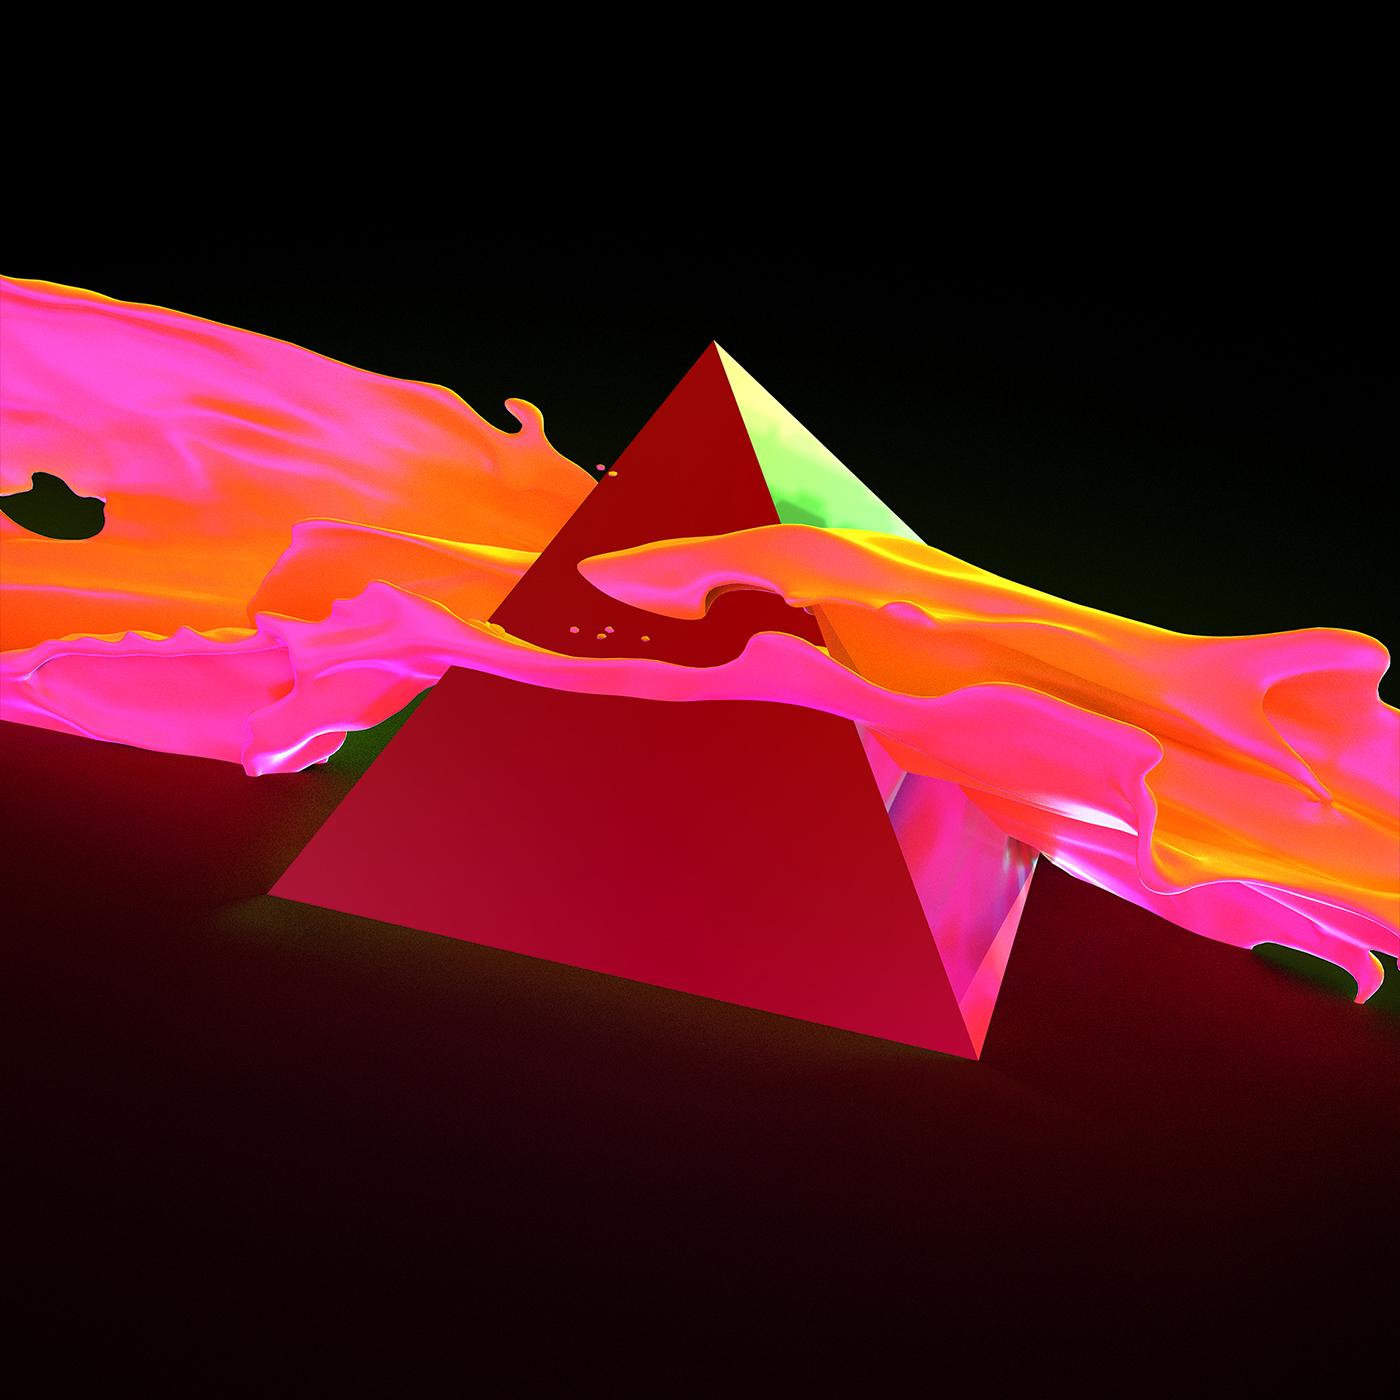 pink floyd albums - HD1400×1400